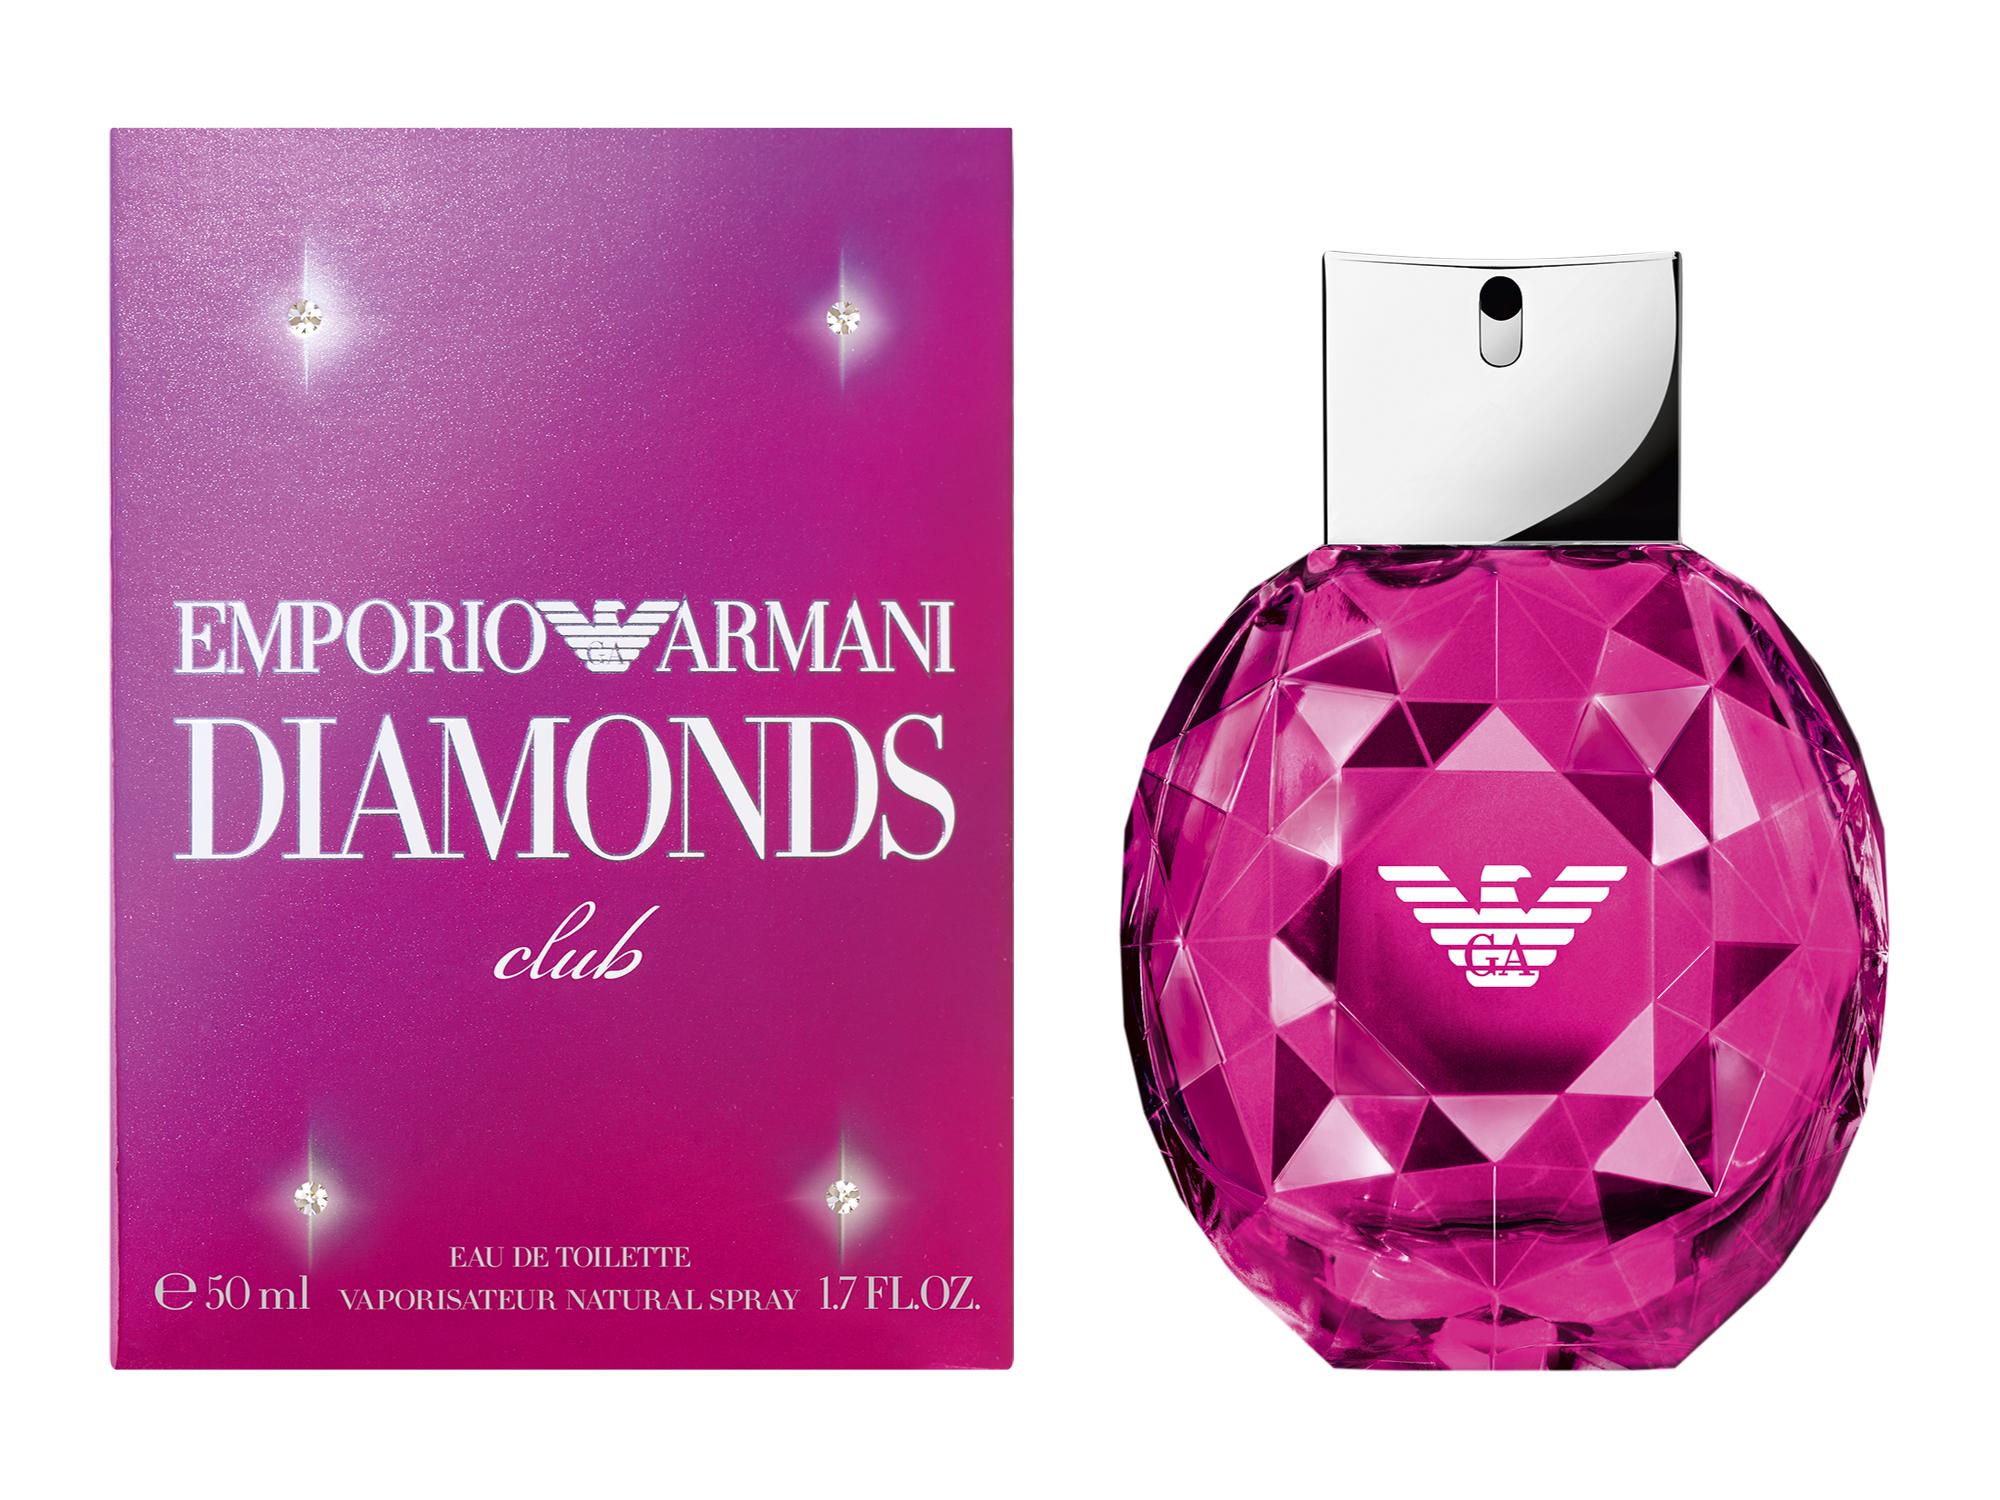 1921144eb5 Emporio Armani Diamonds Club Giorgio Armani perfume - a fragrance ...